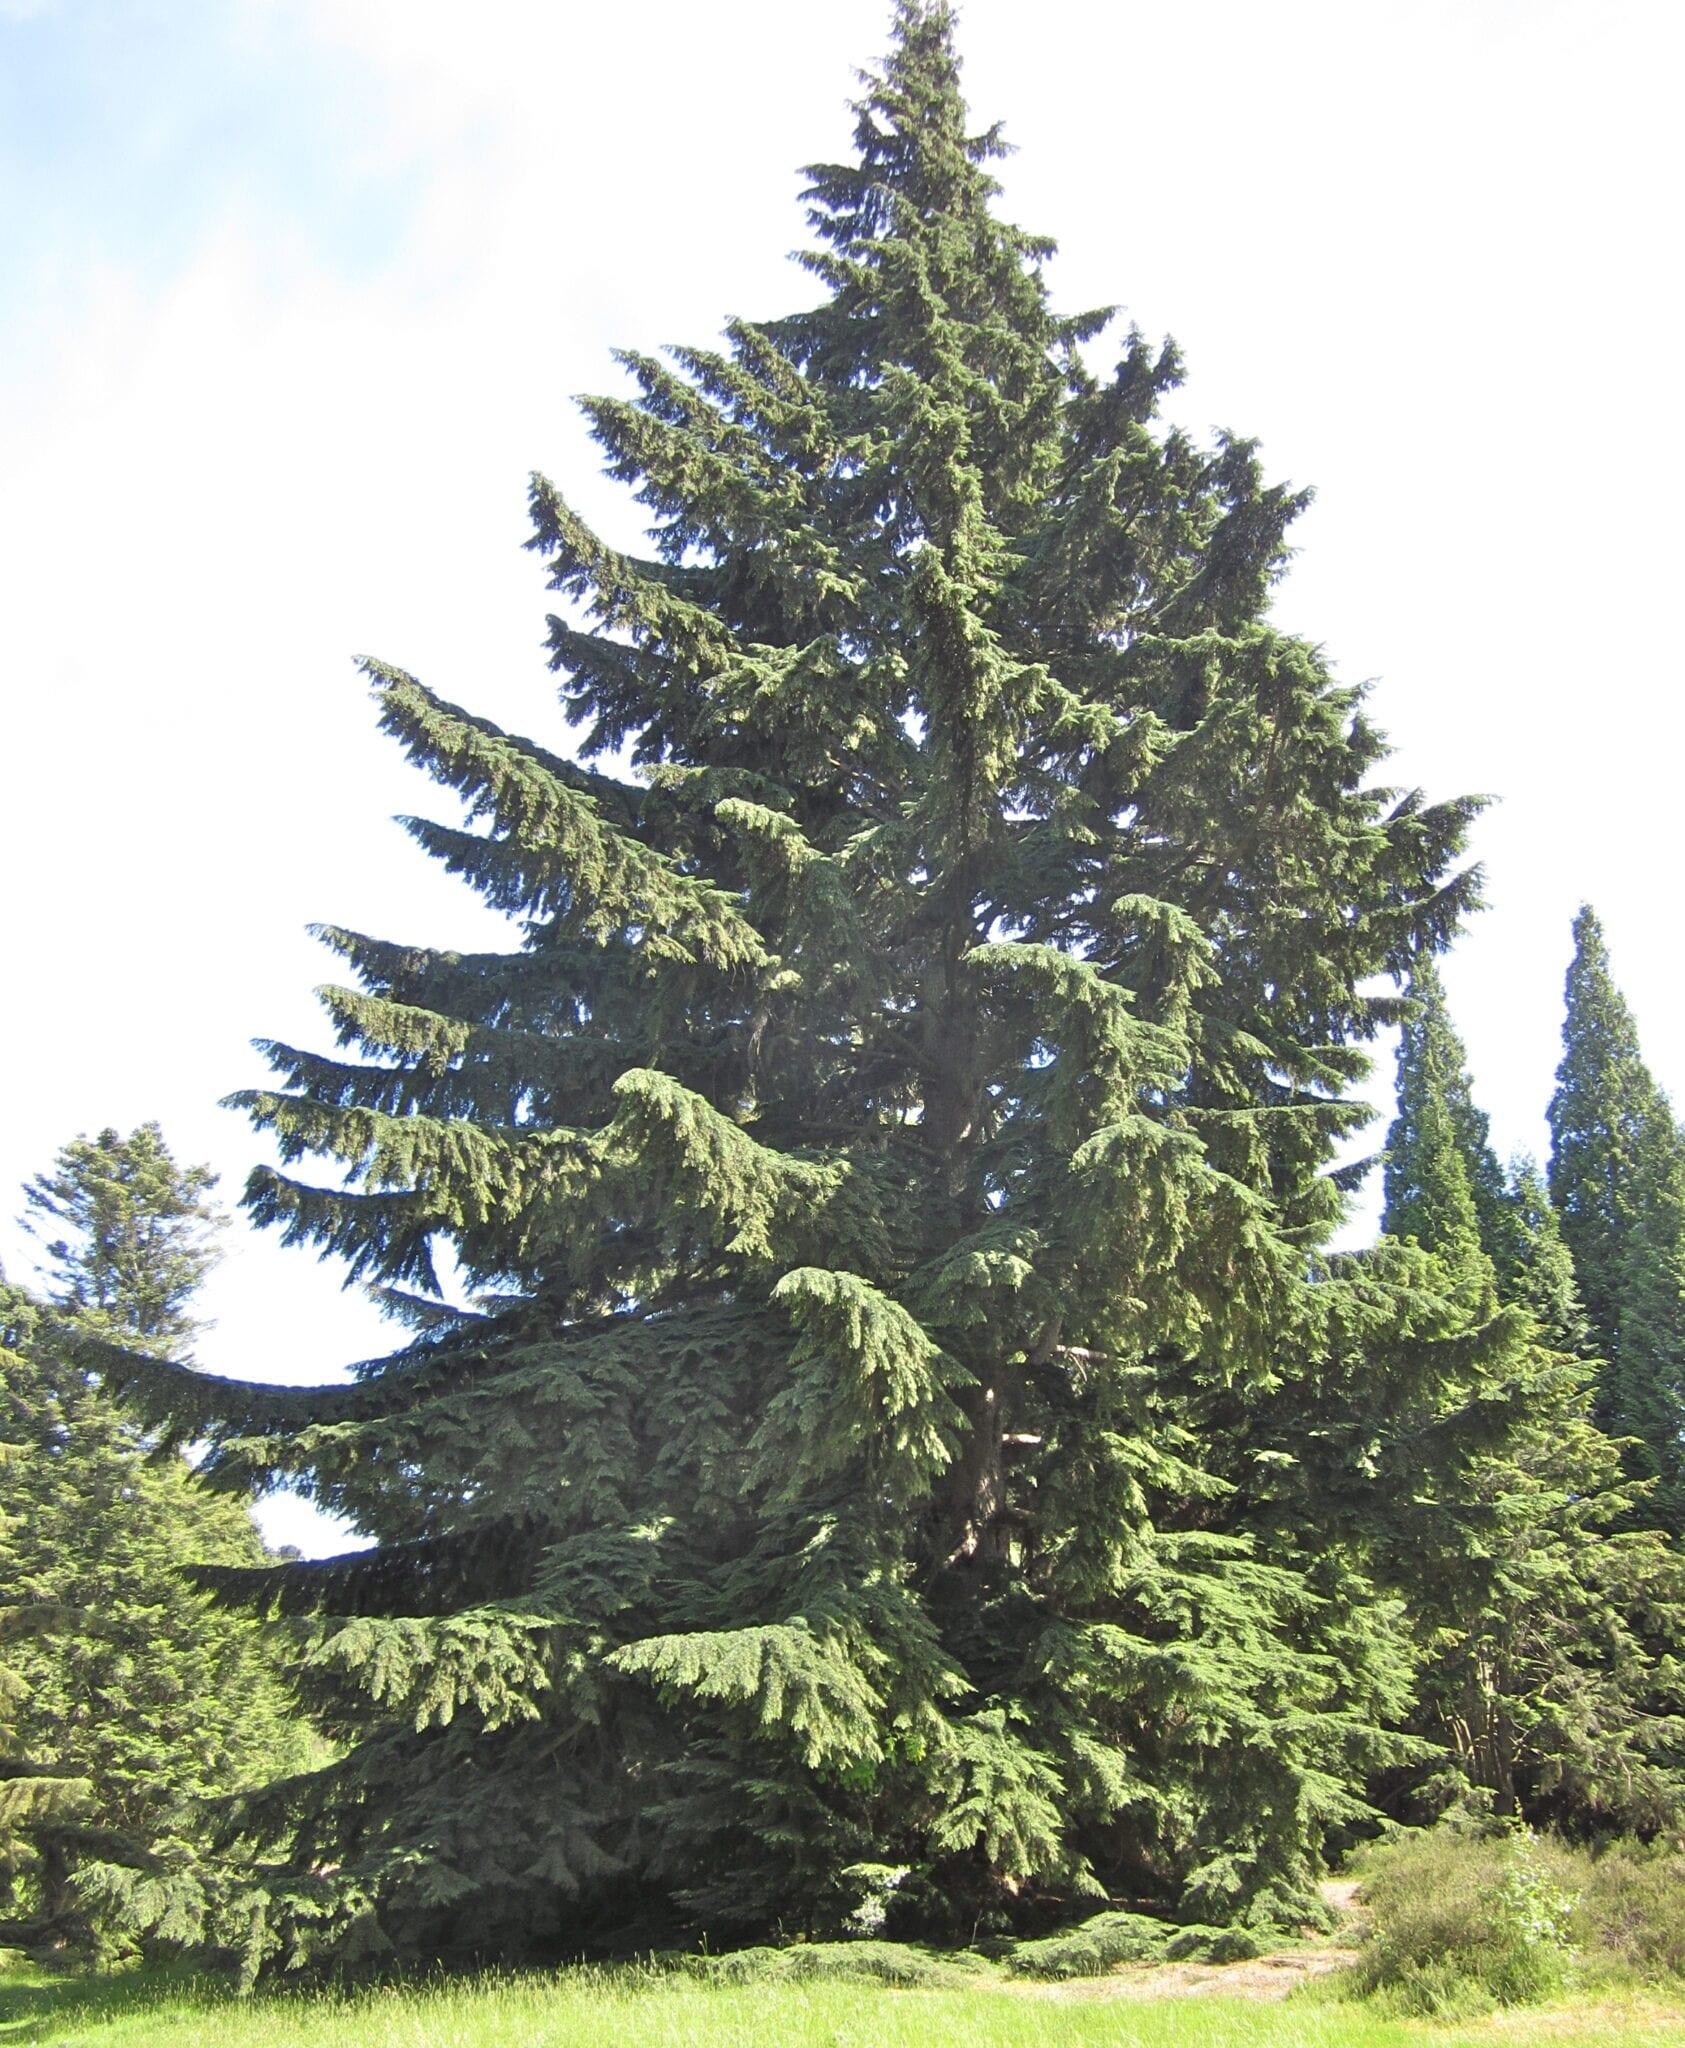 Western Hemlock mature tree